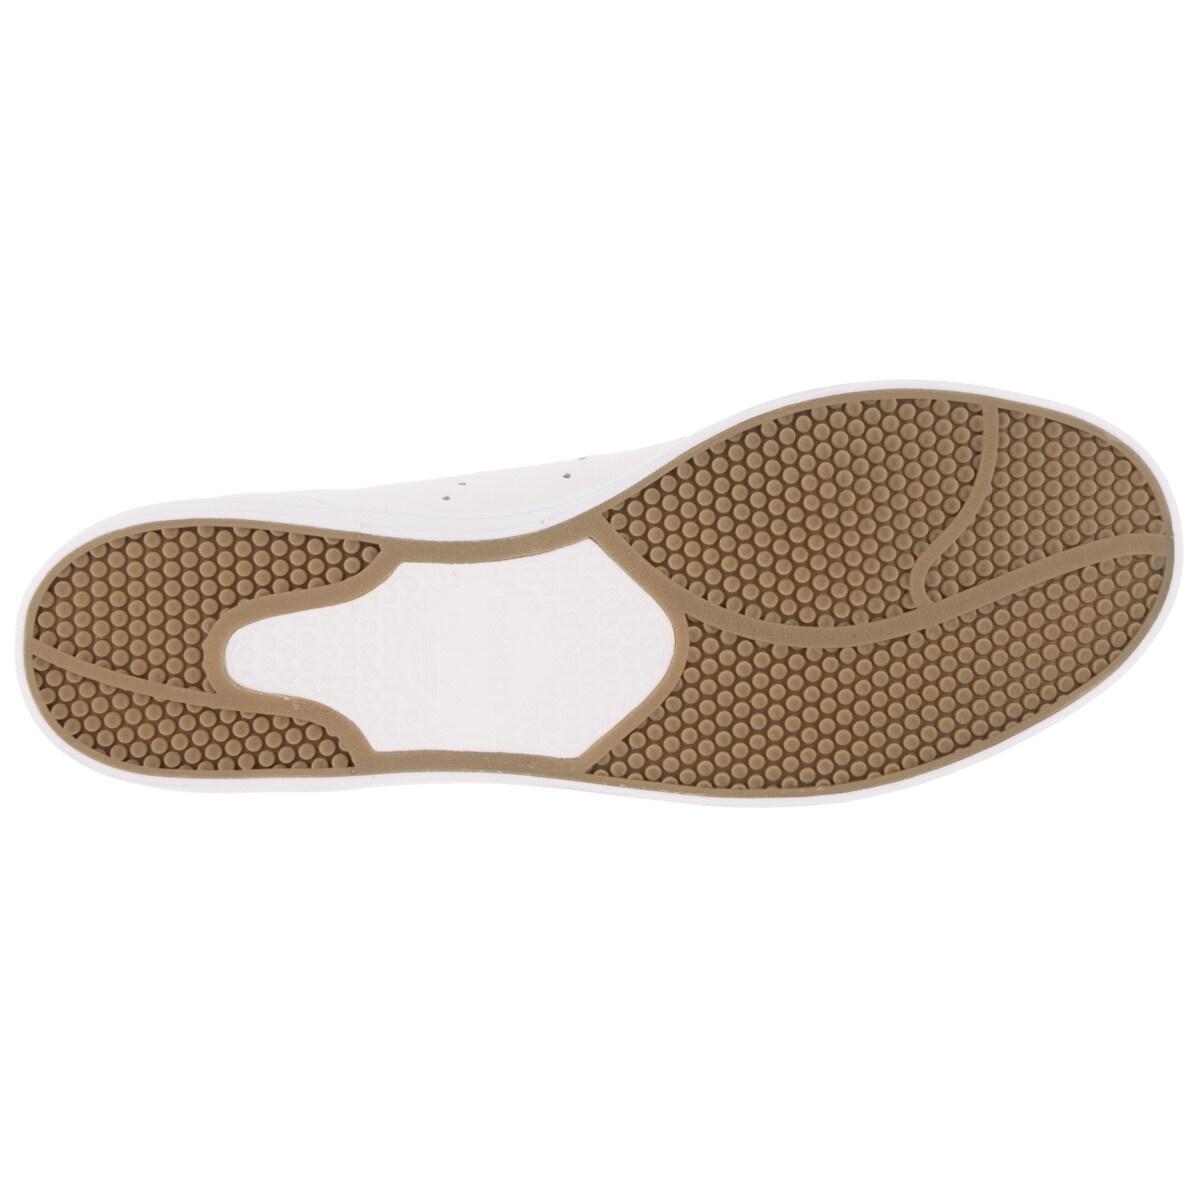 3aefdc18b03 Shop Adidas Men s Stan Smith Vulc Vintage white Green  Skate Shoe - Free  Shipping Today - Overstock.com - 12320009